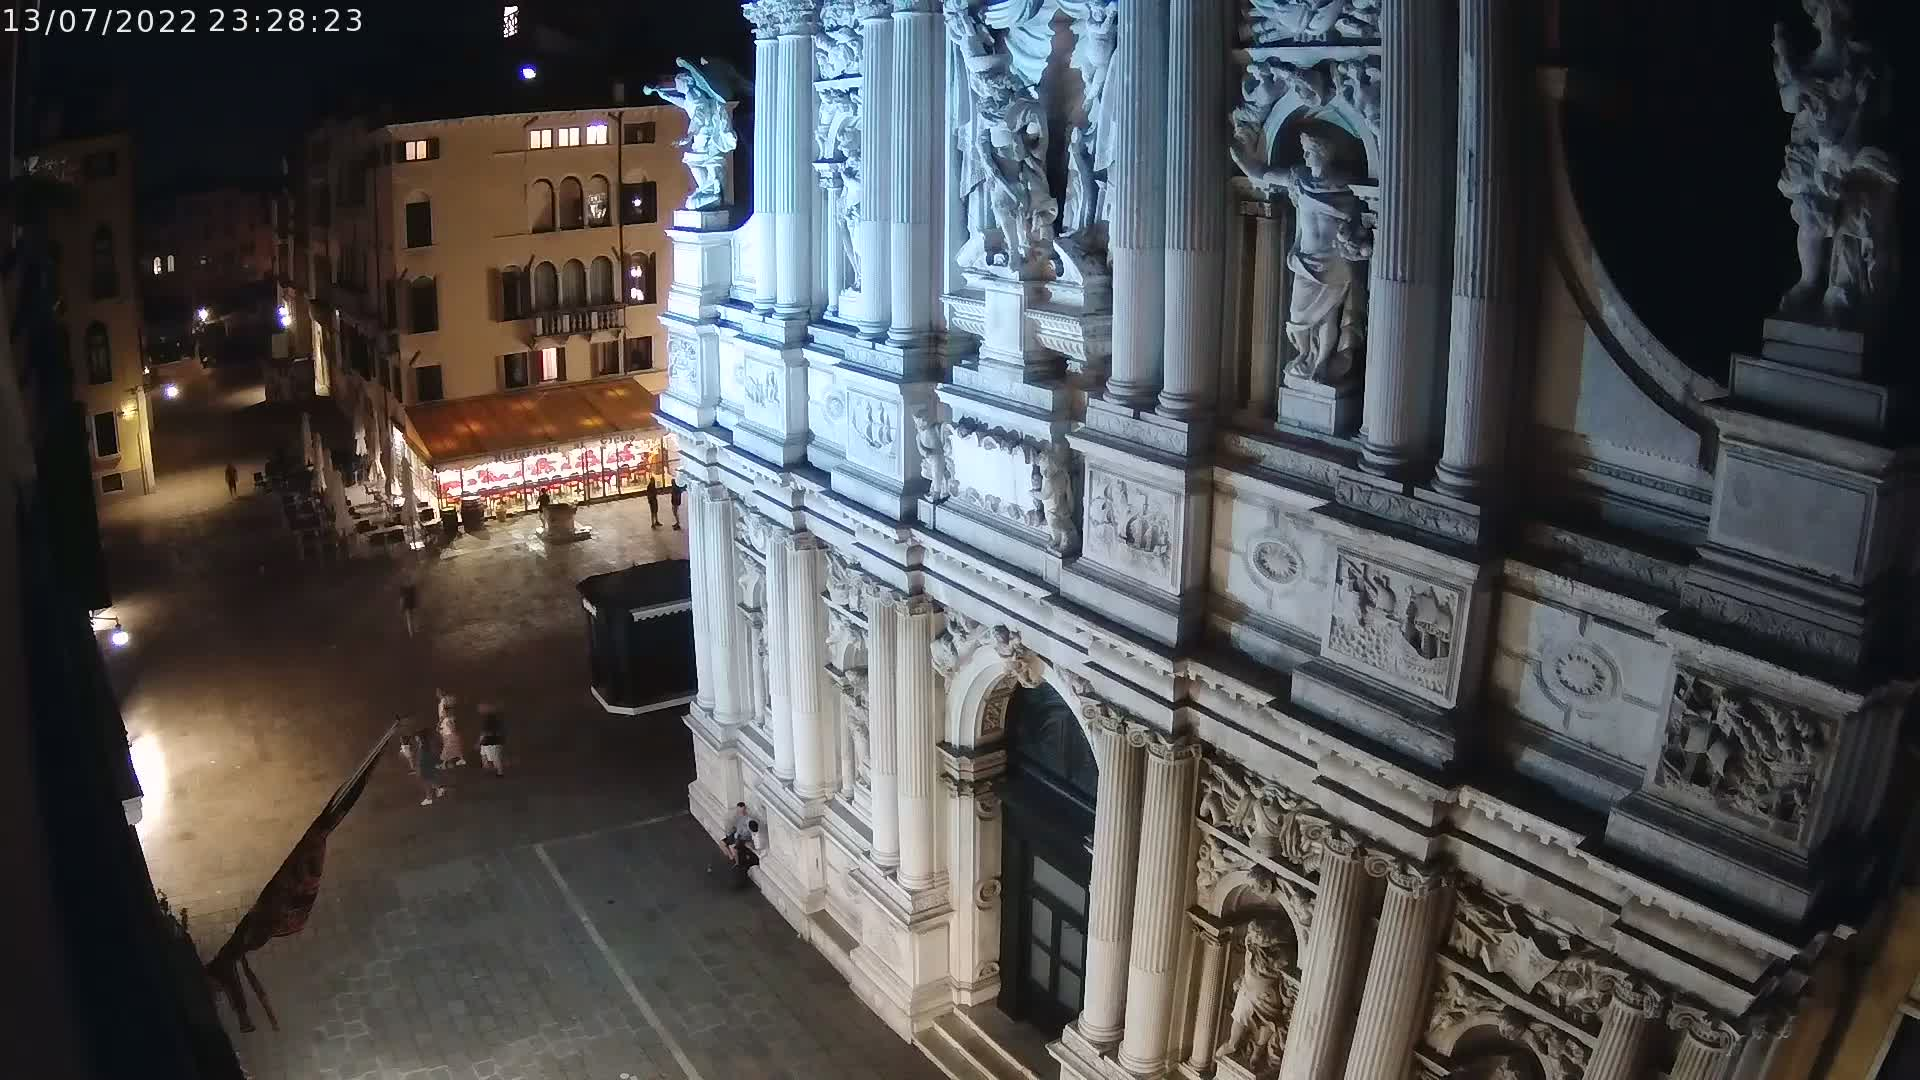 Venedig Fr. 23:30